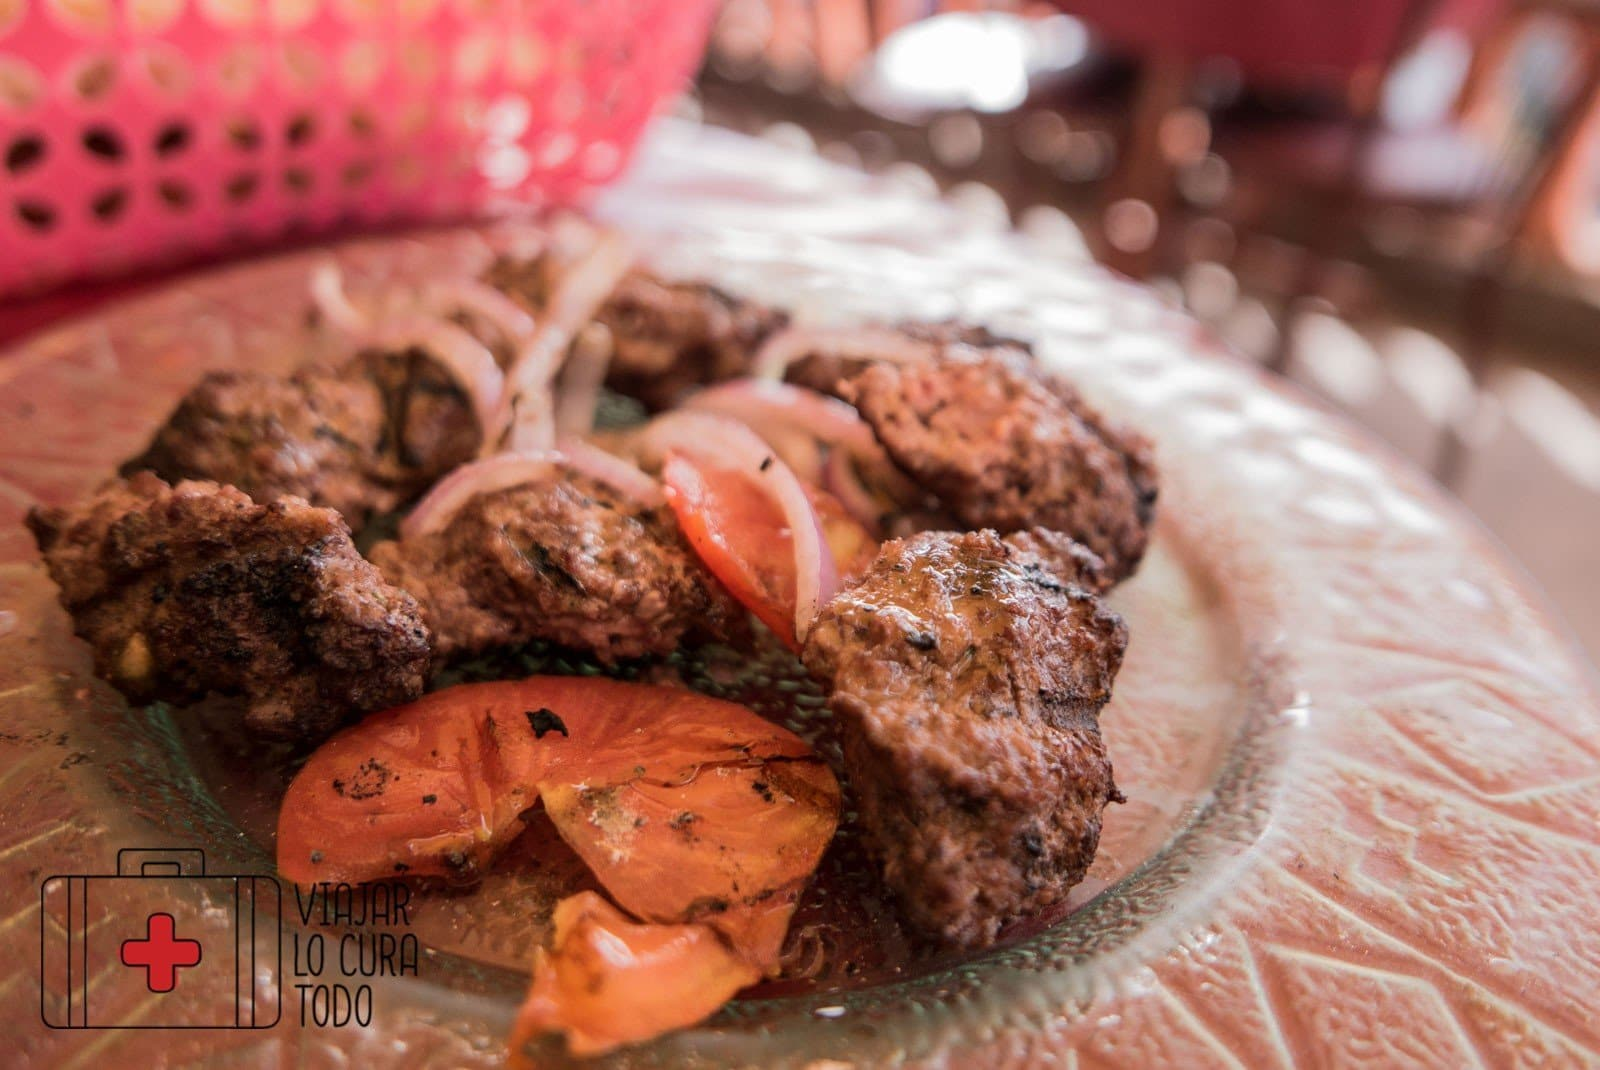 marruecos foodie